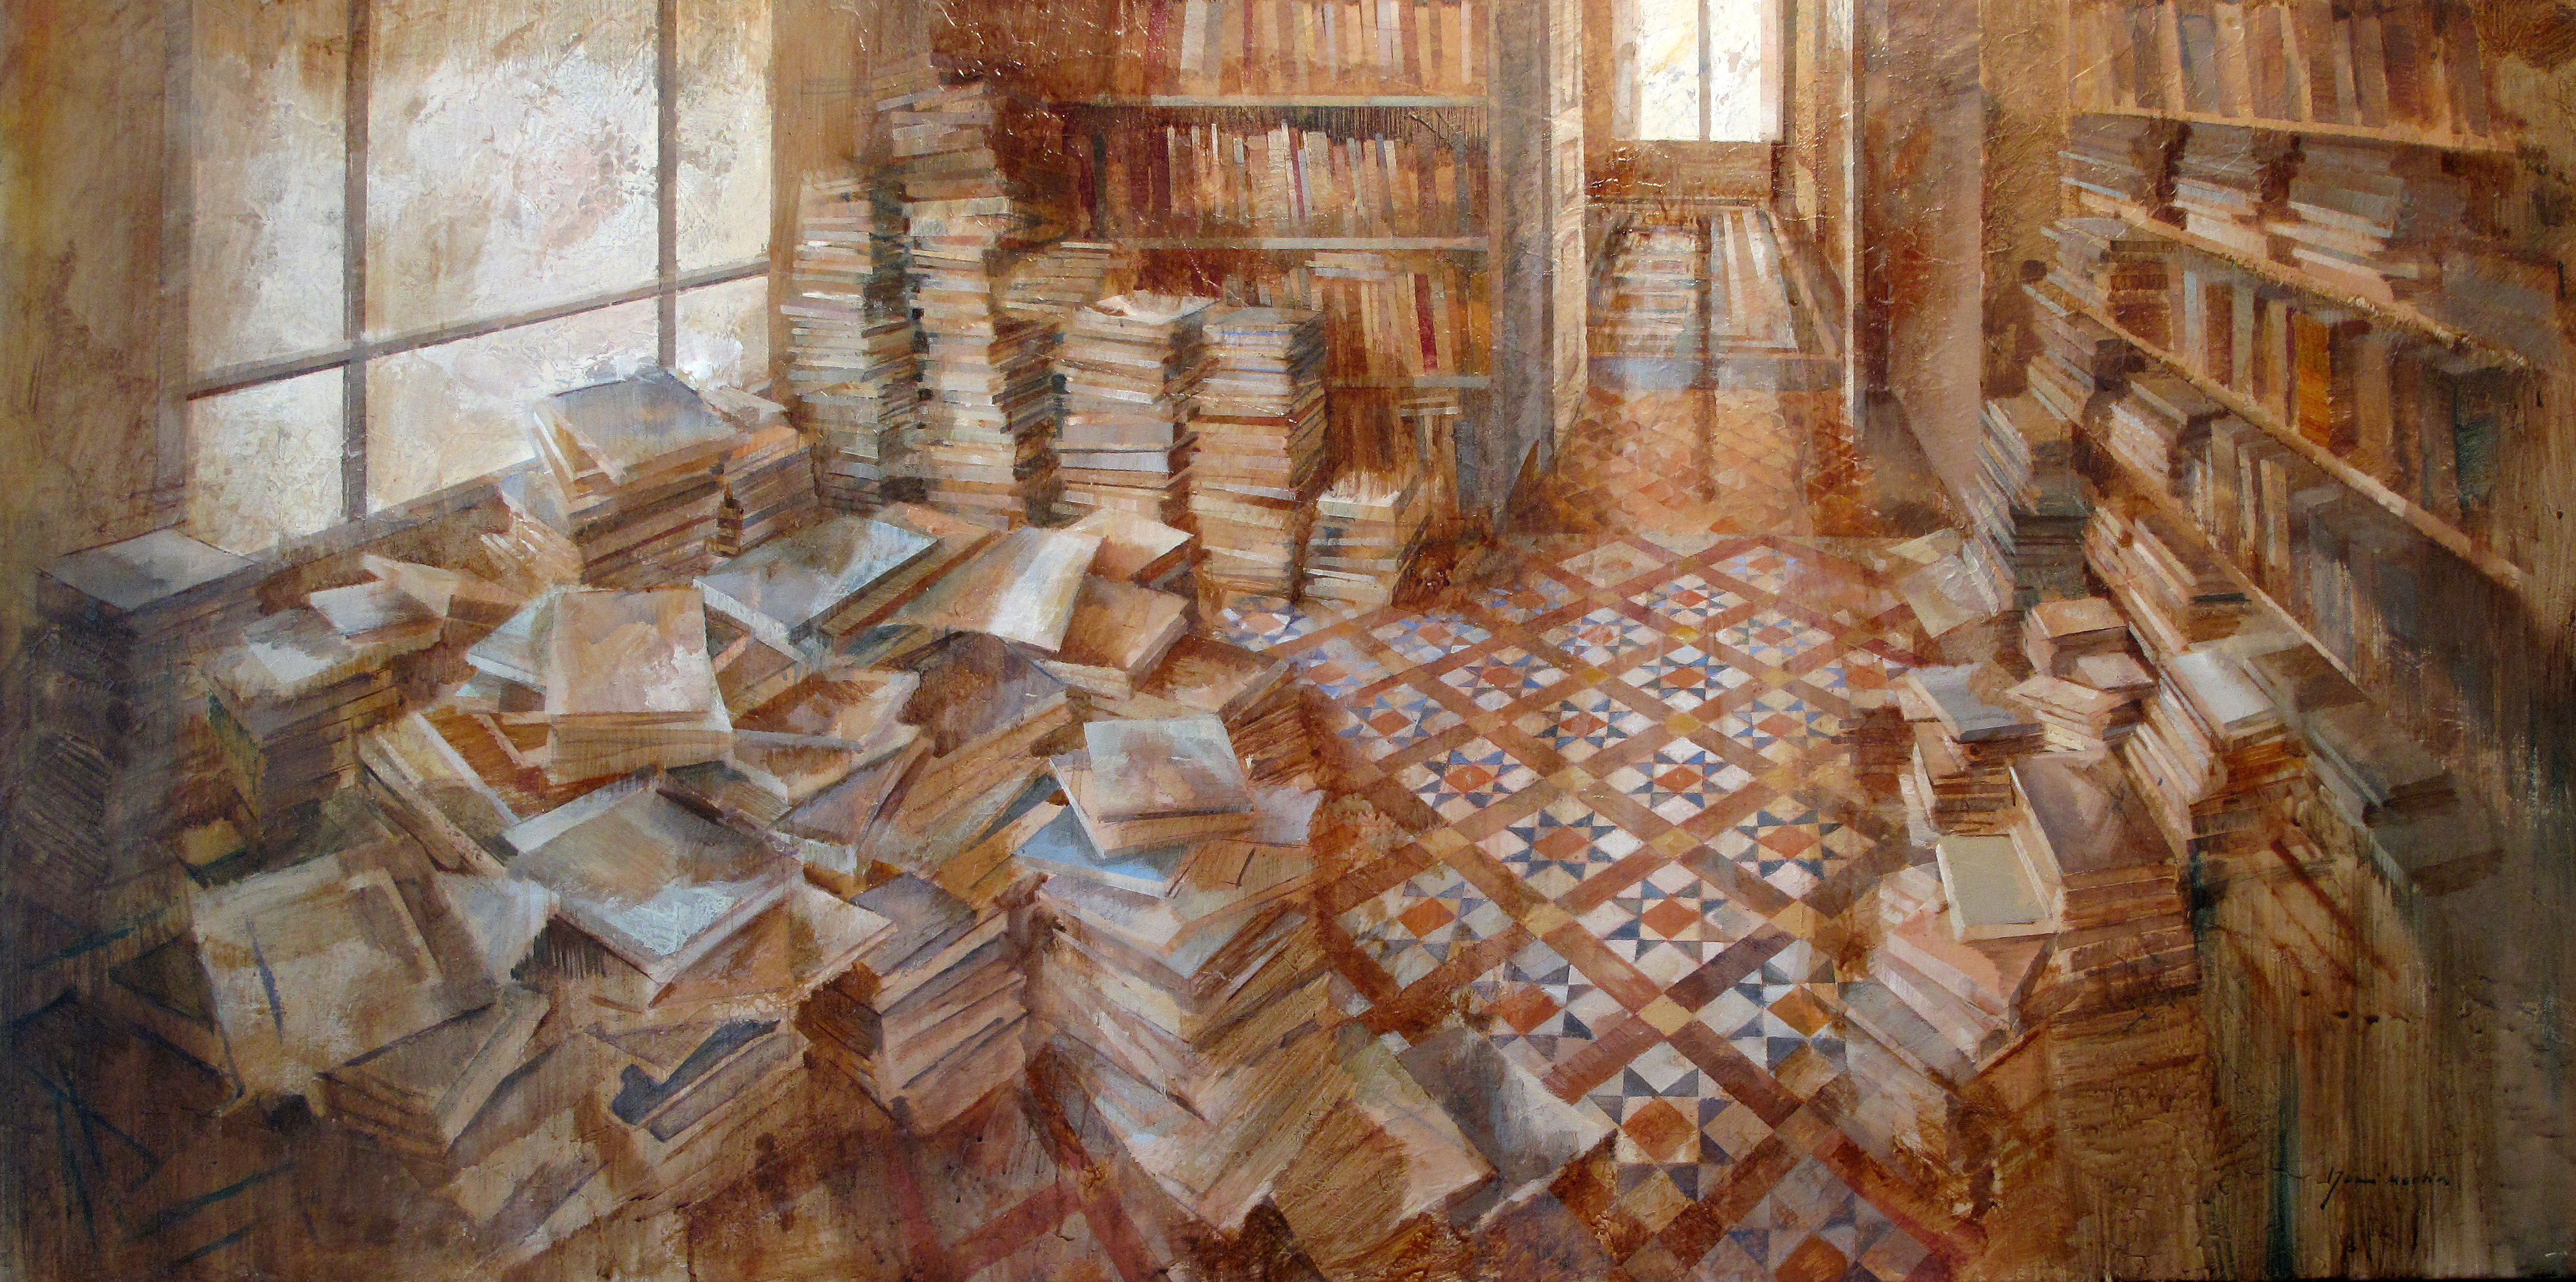 ambiente literario 75 x 150 cm